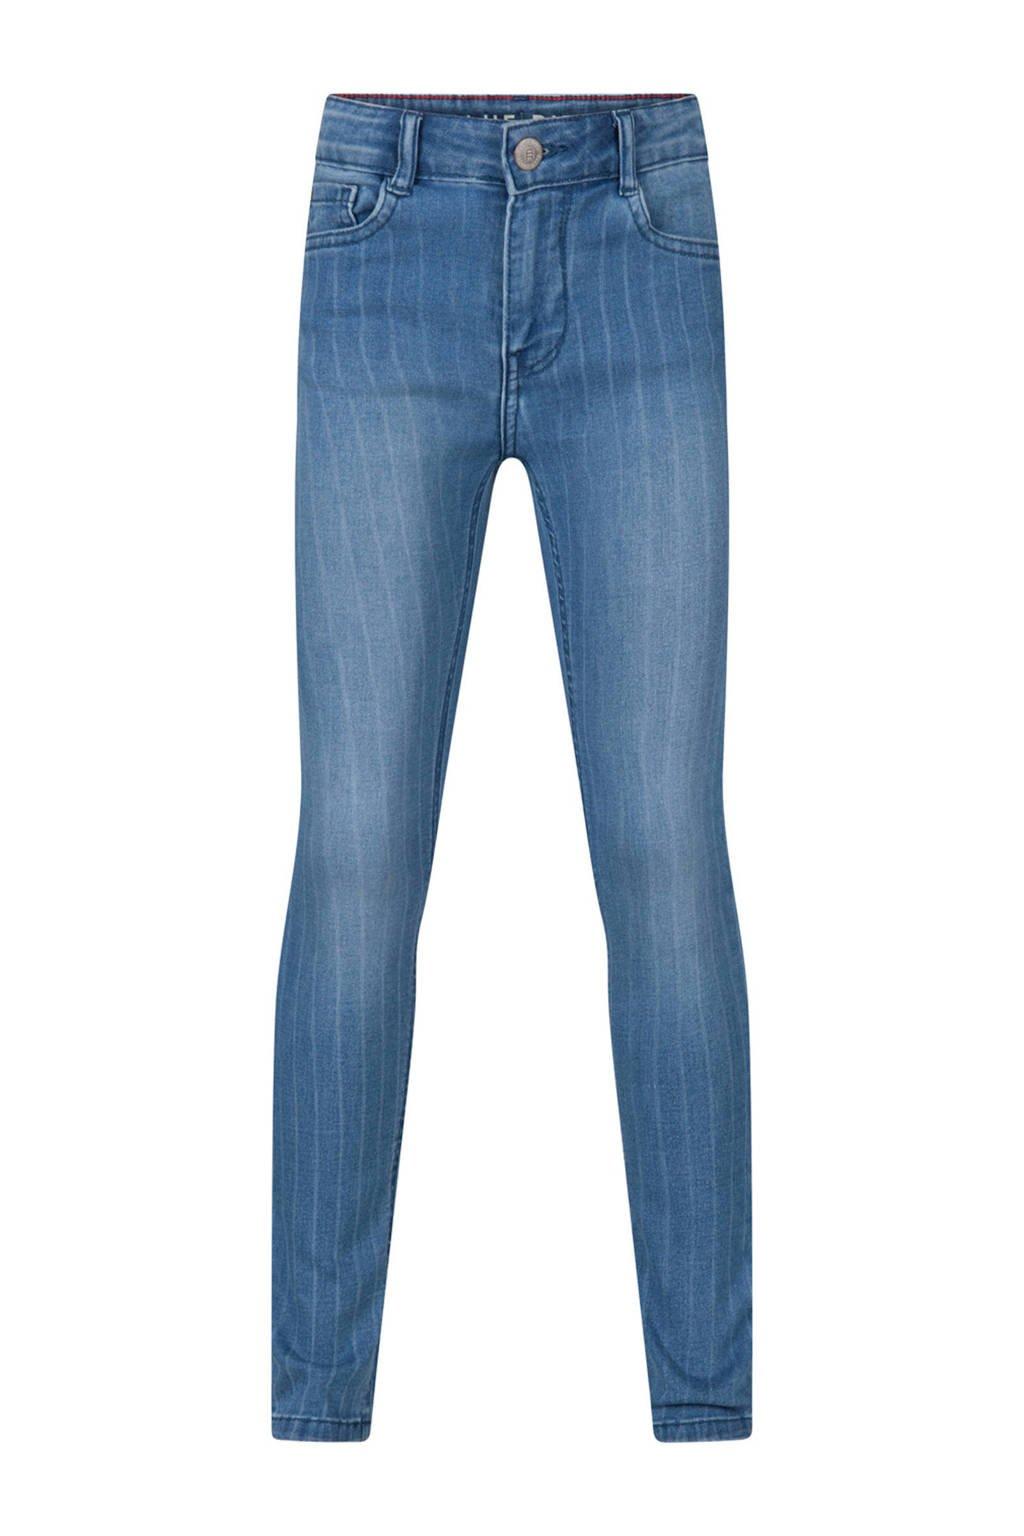 WE Fashion Blue Ridge skinny jeans blauw, Blauw